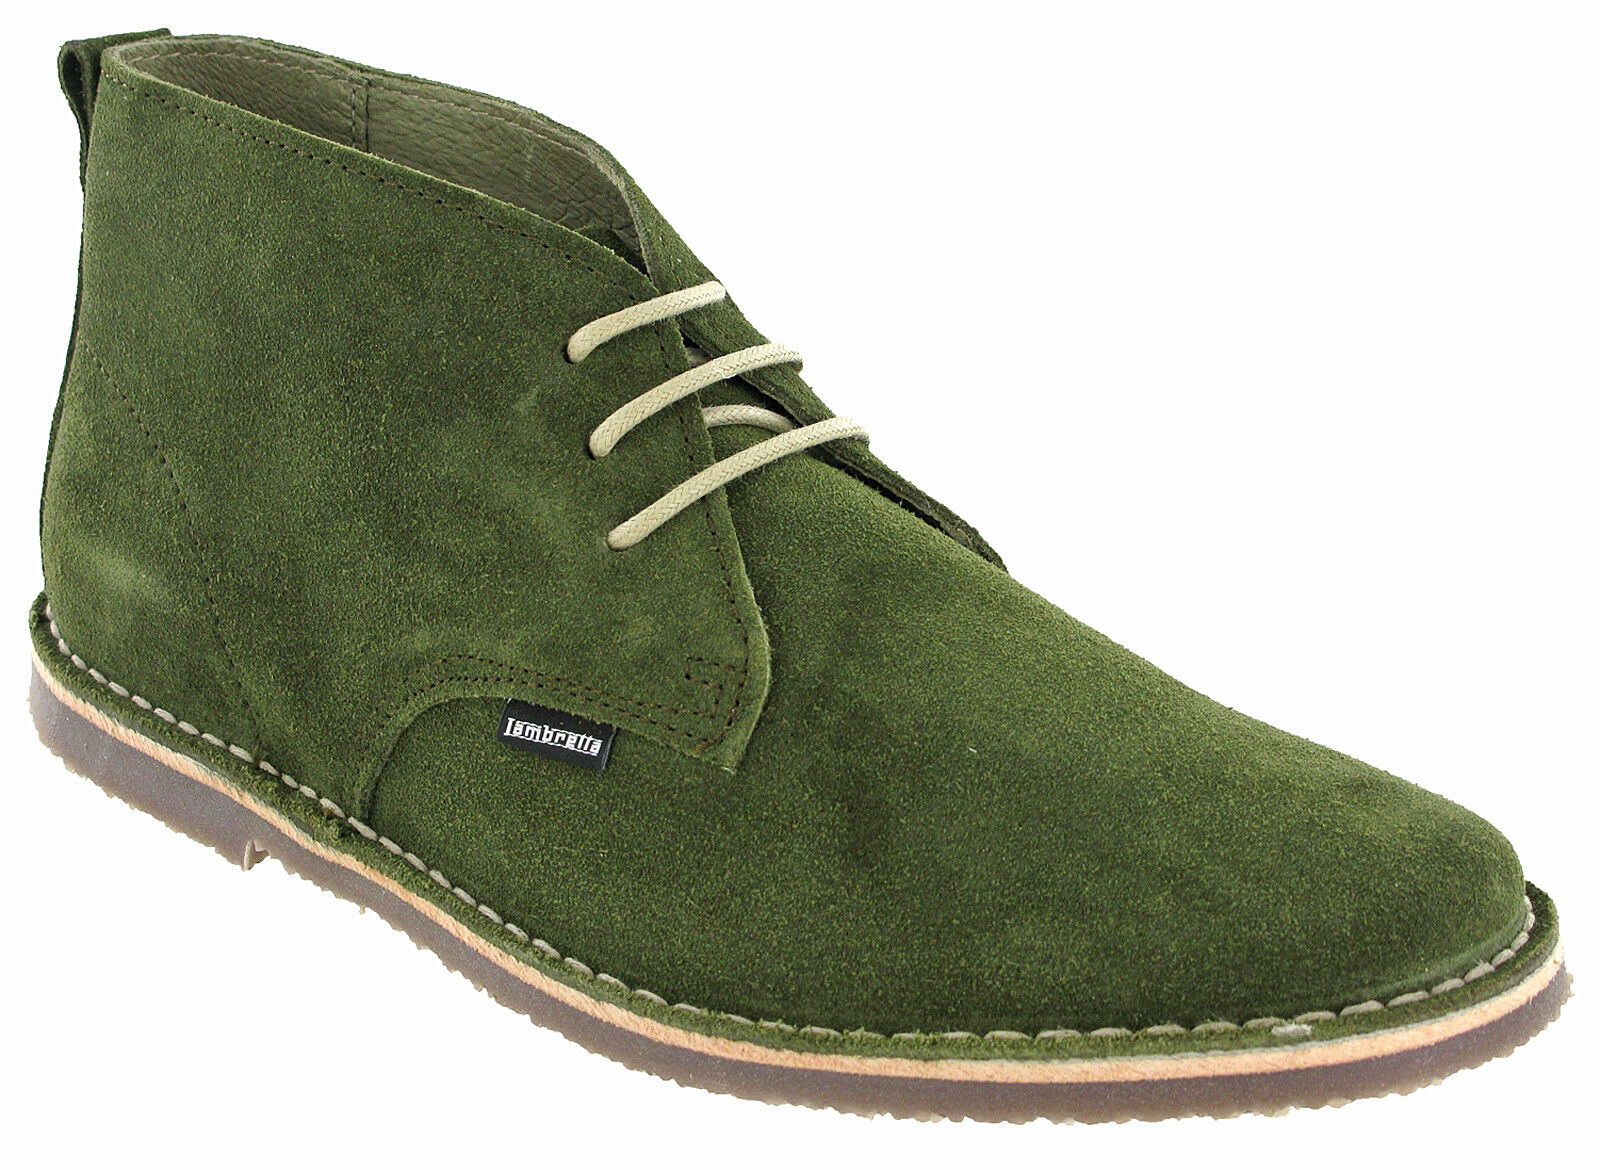 Lambretta Desert Boots Suede Mens Flat Selecter UK Padded MOD Round Toe UK Selecter 7-12 745ea5